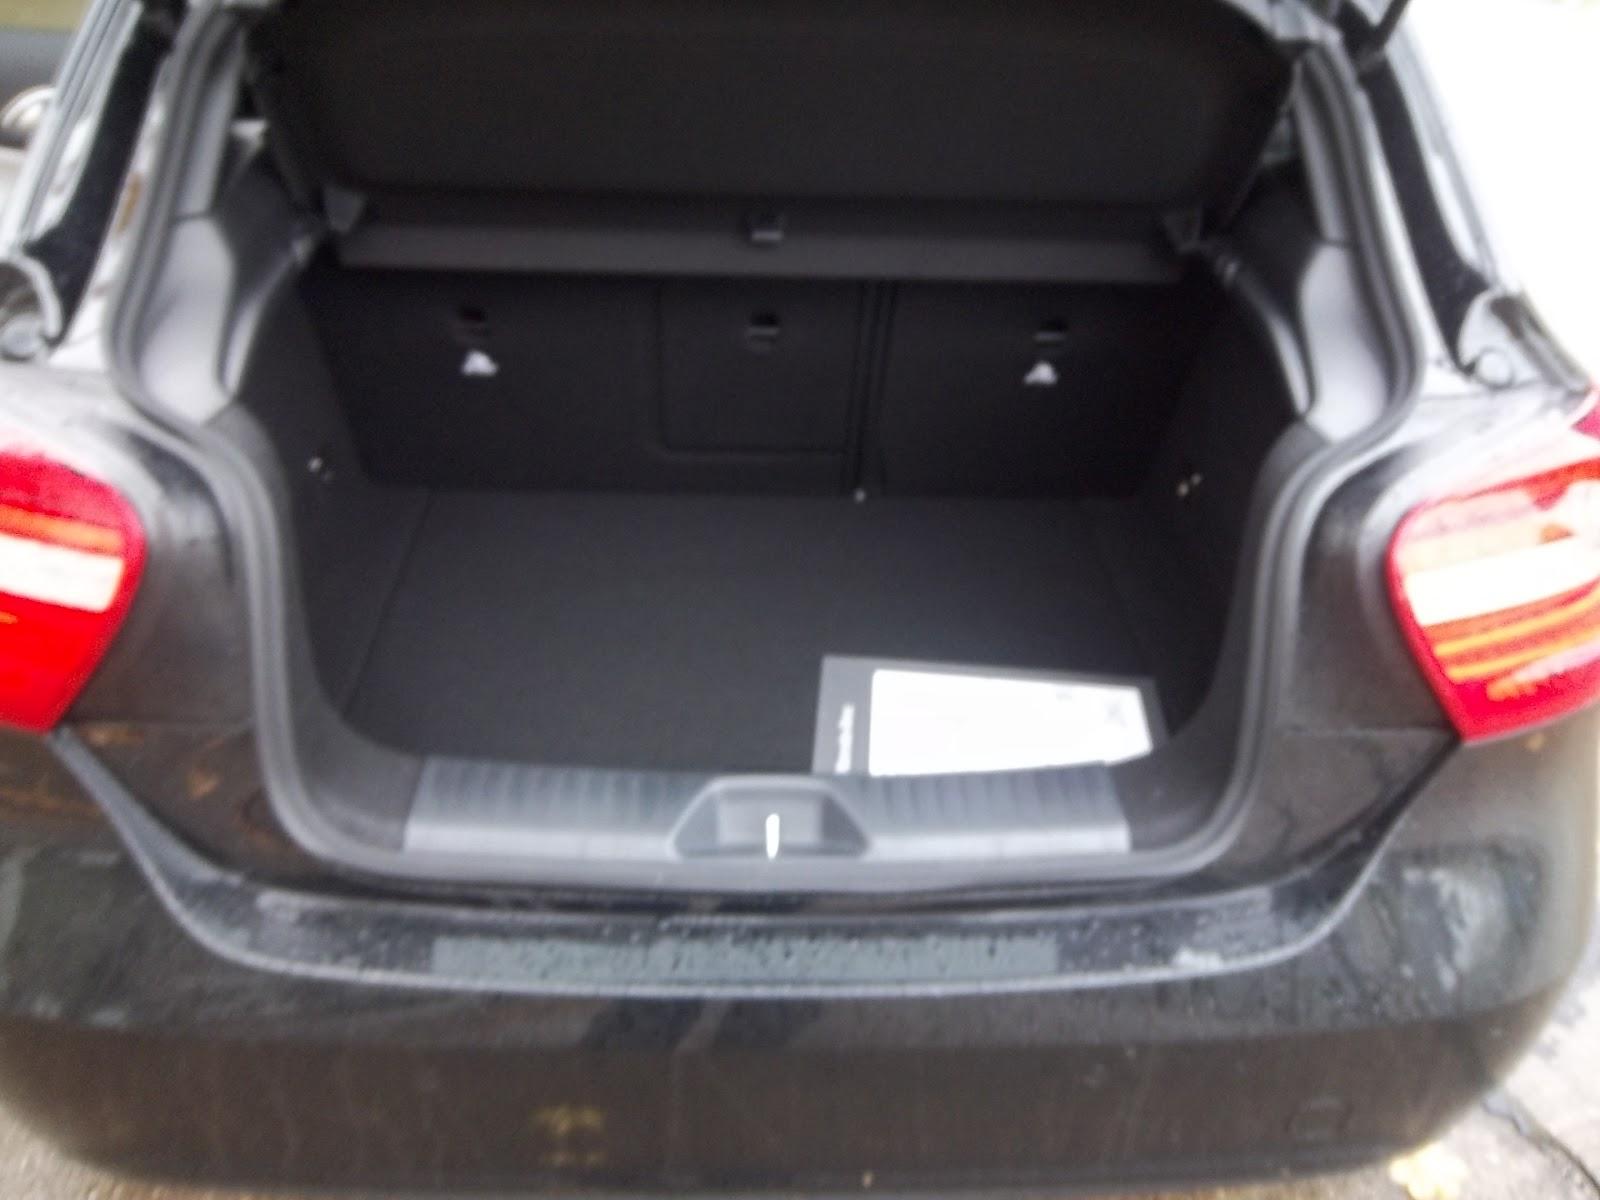 fahrbericht mercedes benz a 180 blue efficiency myauto24. Black Bedroom Furniture Sets. Home Design Ideas